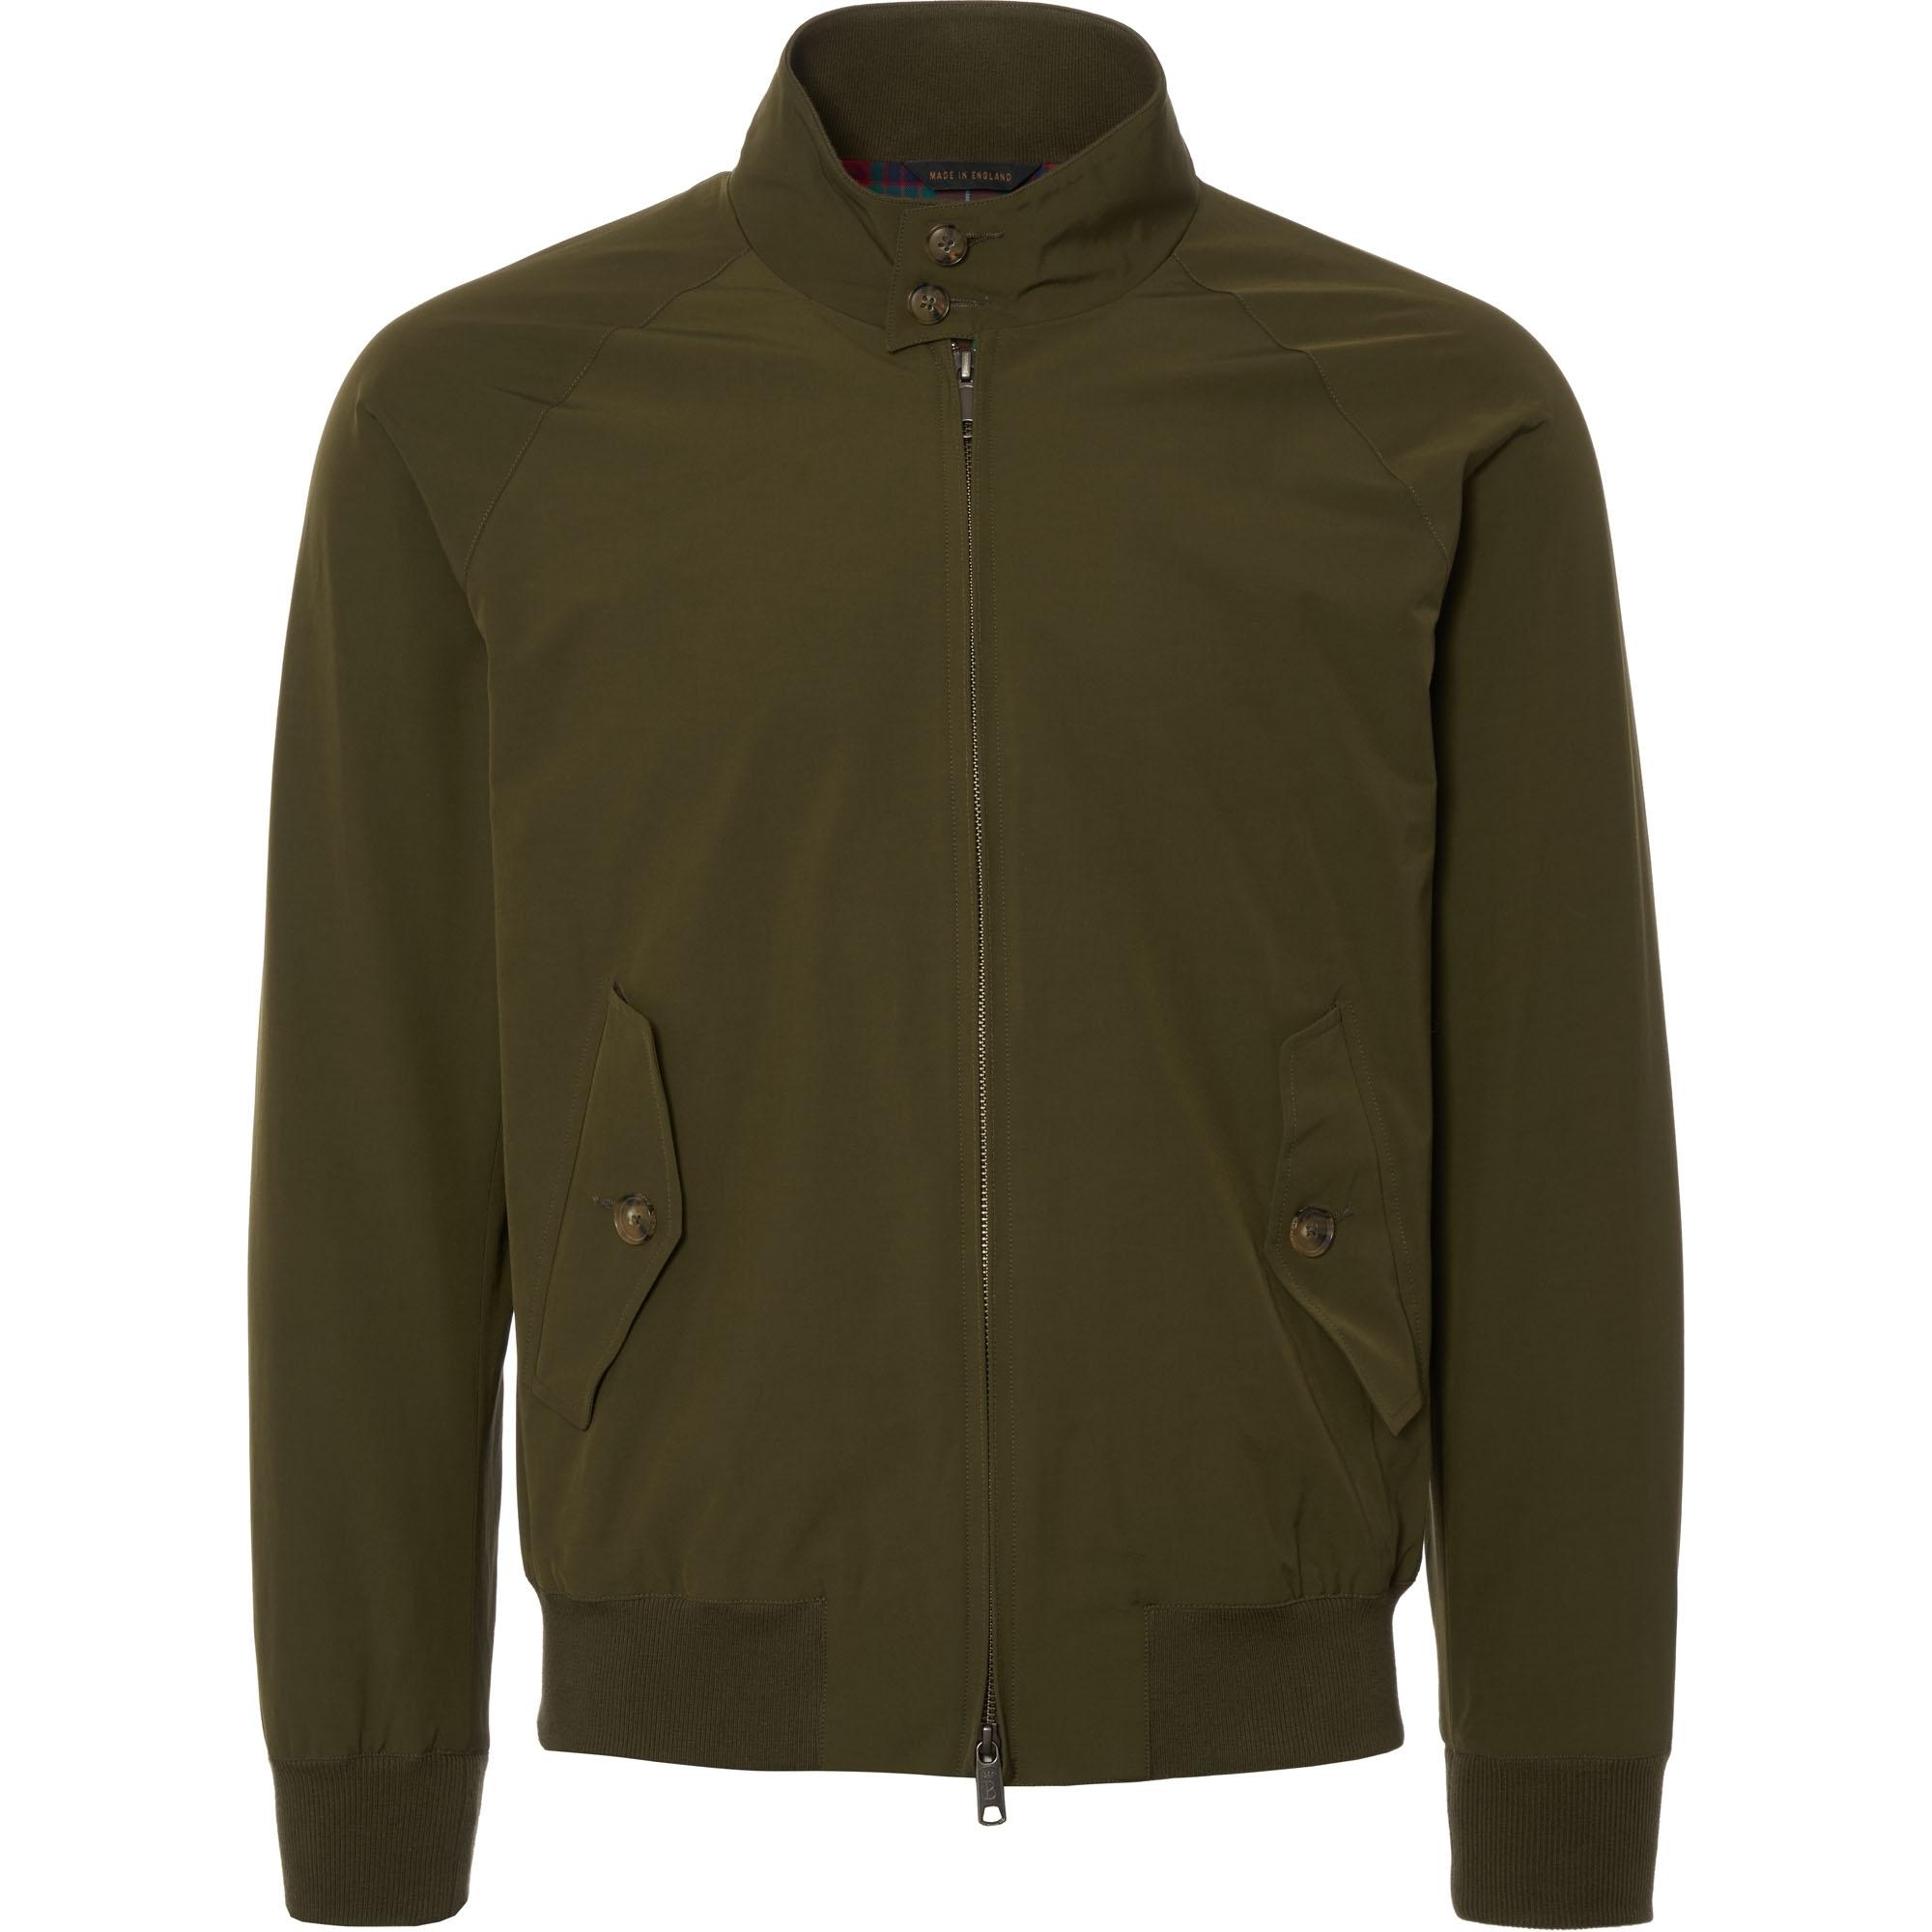 26a5265cfc Baracuta G9 Slim Fit Harrington jacket Military Green